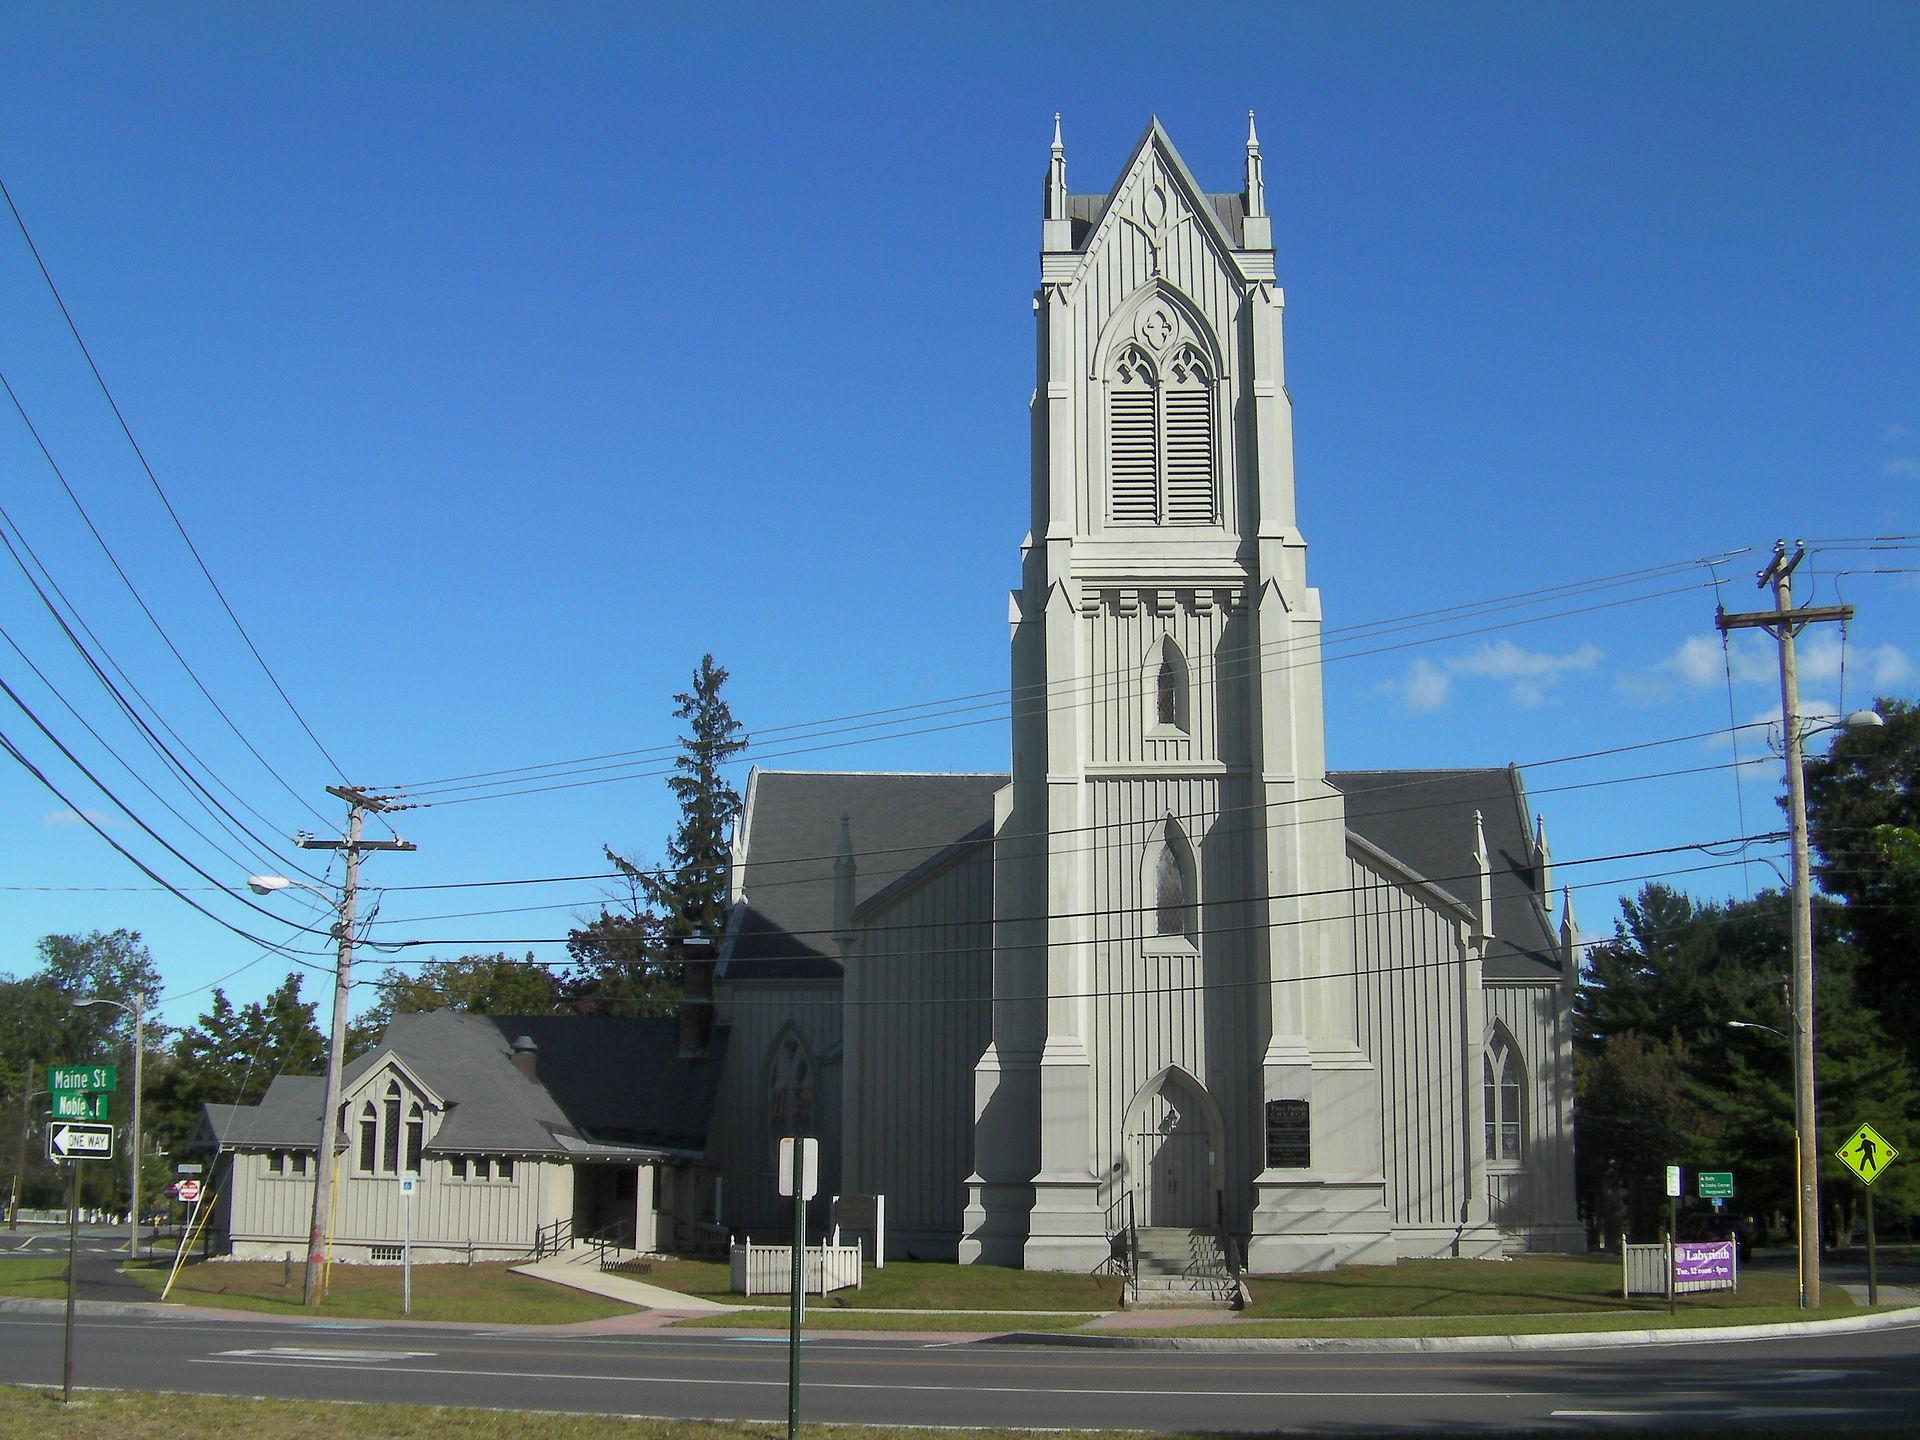 Brunswick Maine Property Taxes Increase